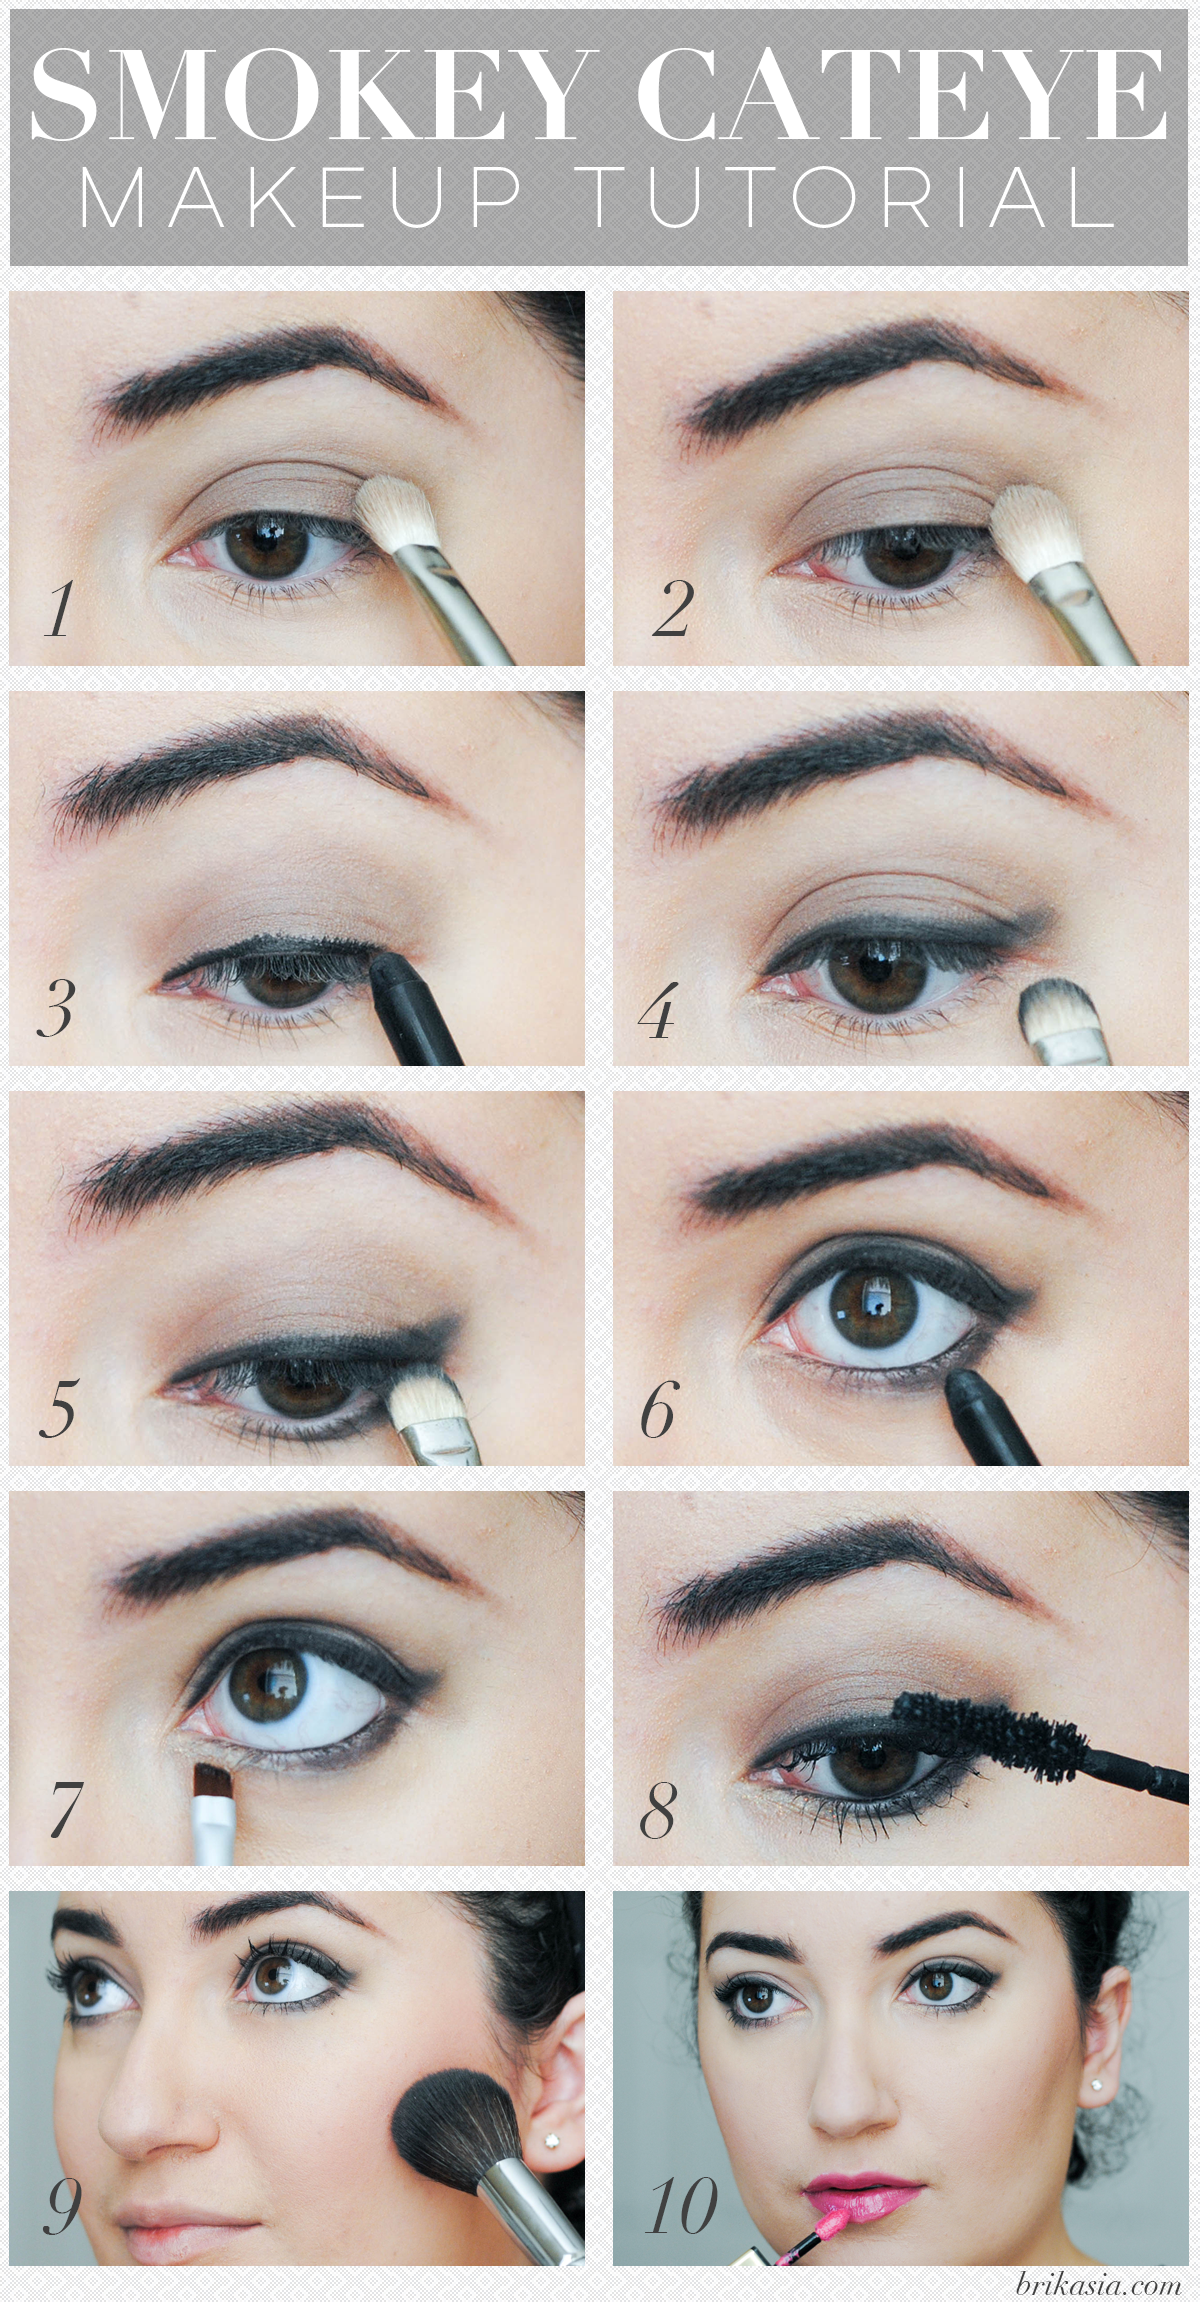 Smokey cateye makeup tutorial makeup tutorials and hair makeup smokey cateye makeup tutorial baditri Choice Image